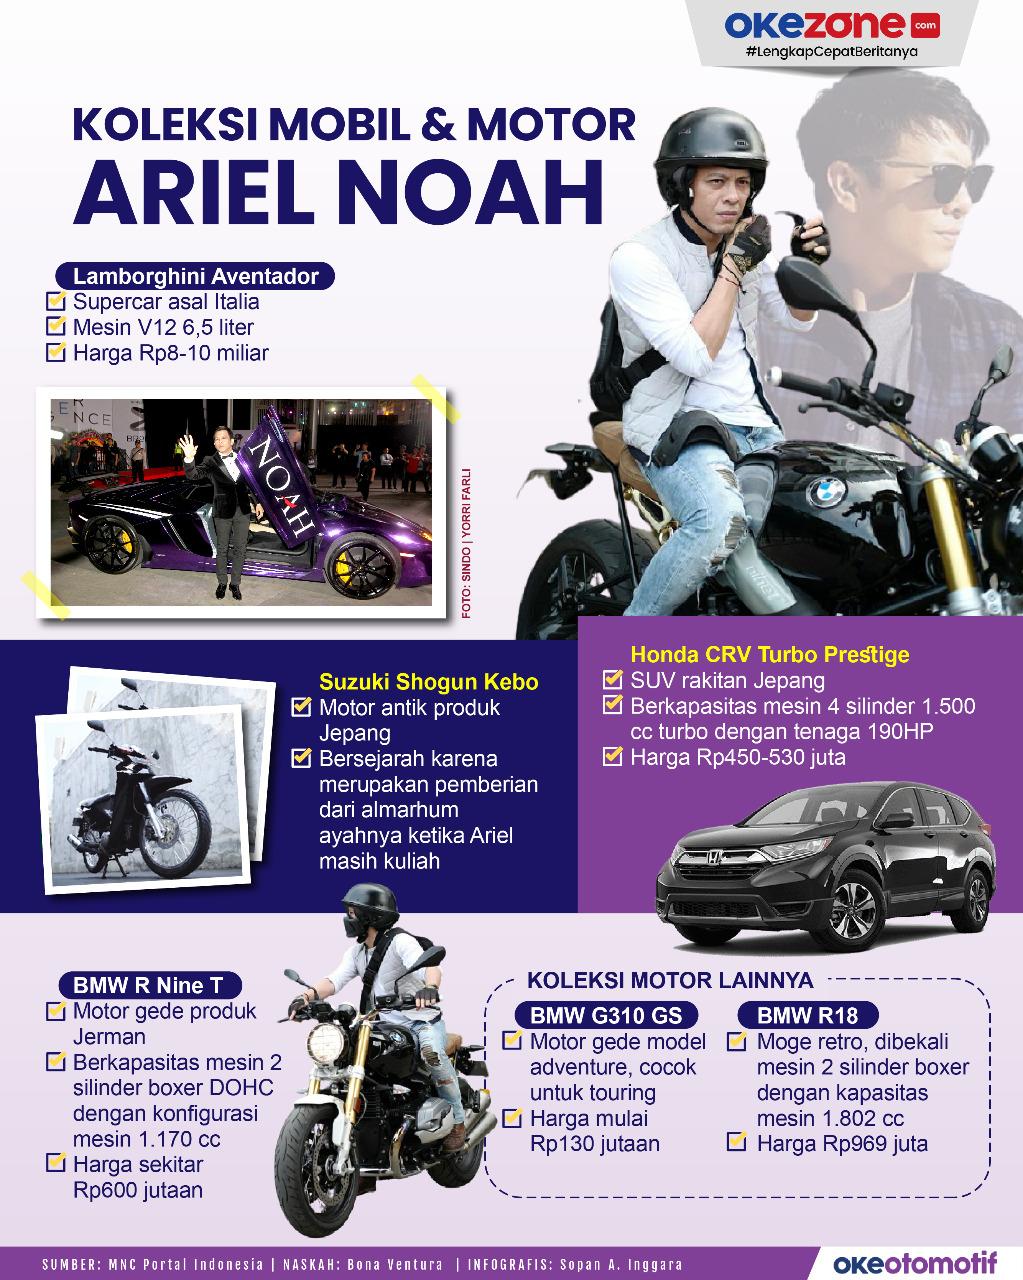 Koleksi Mobil dan Motor Ariel Noah, Ada Lamborghini Aventador -